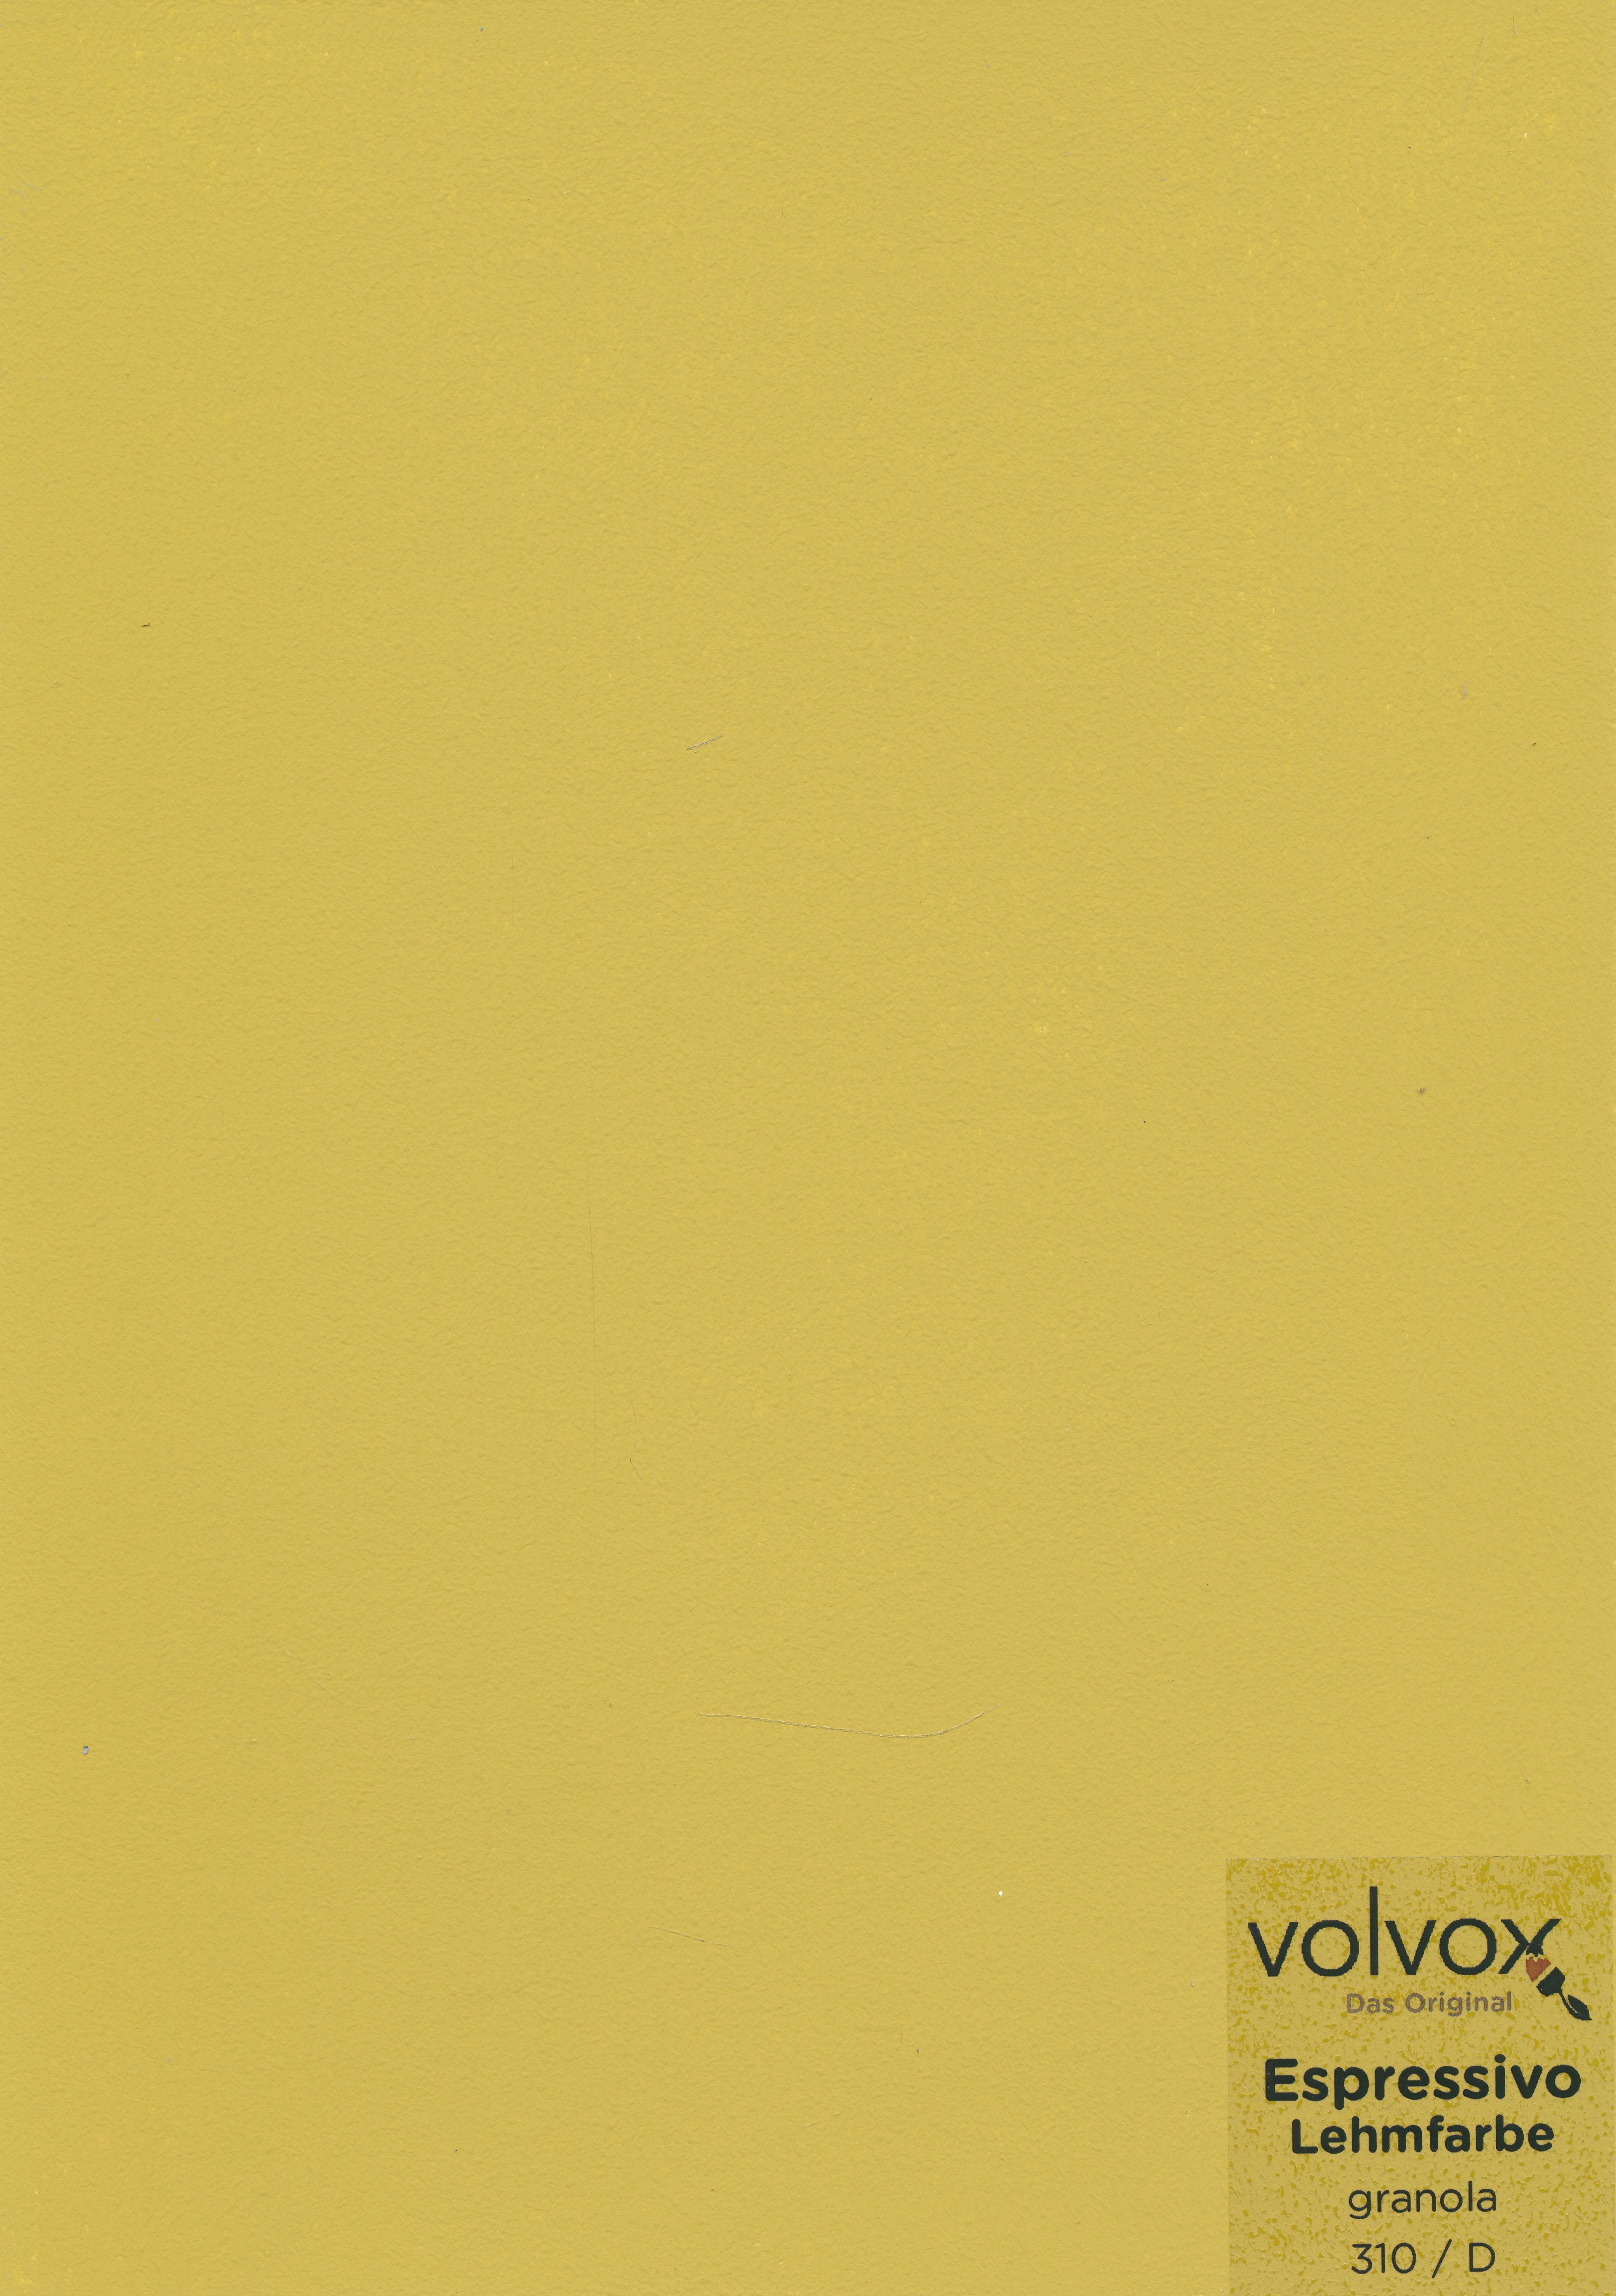 Volvox Espressivo Lehmfarbe 310 granola